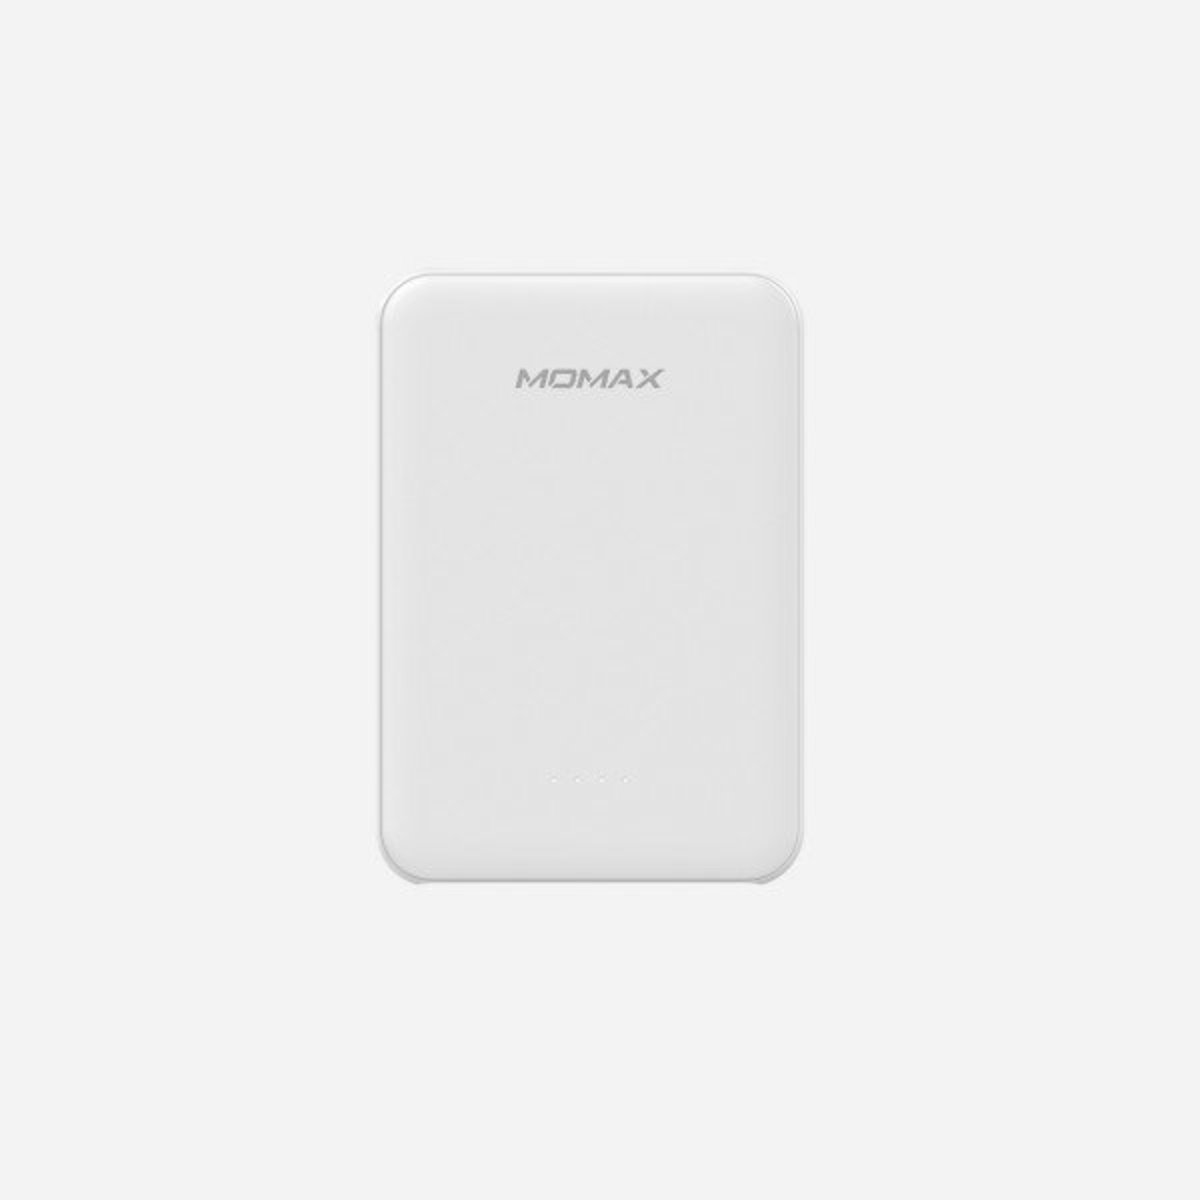 iPower Card 2 流動電源[IP69][白色][5000mAh]